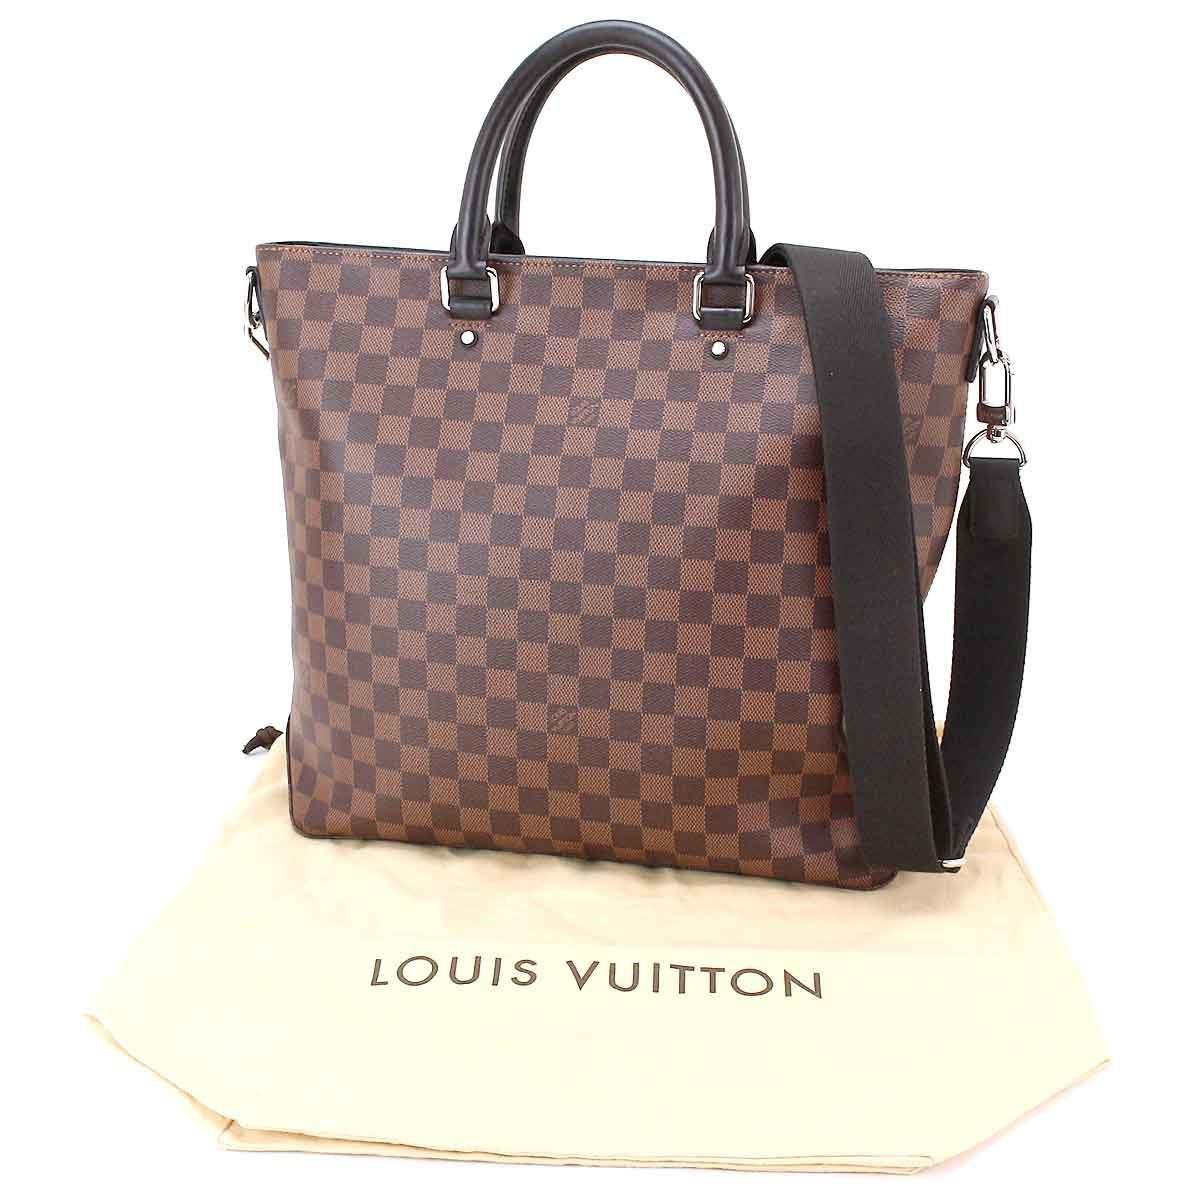 Lyst - Louis Vuitton Damier Ebene Jake Tote 2way Shoulder Tote Bag ... 4609736315714